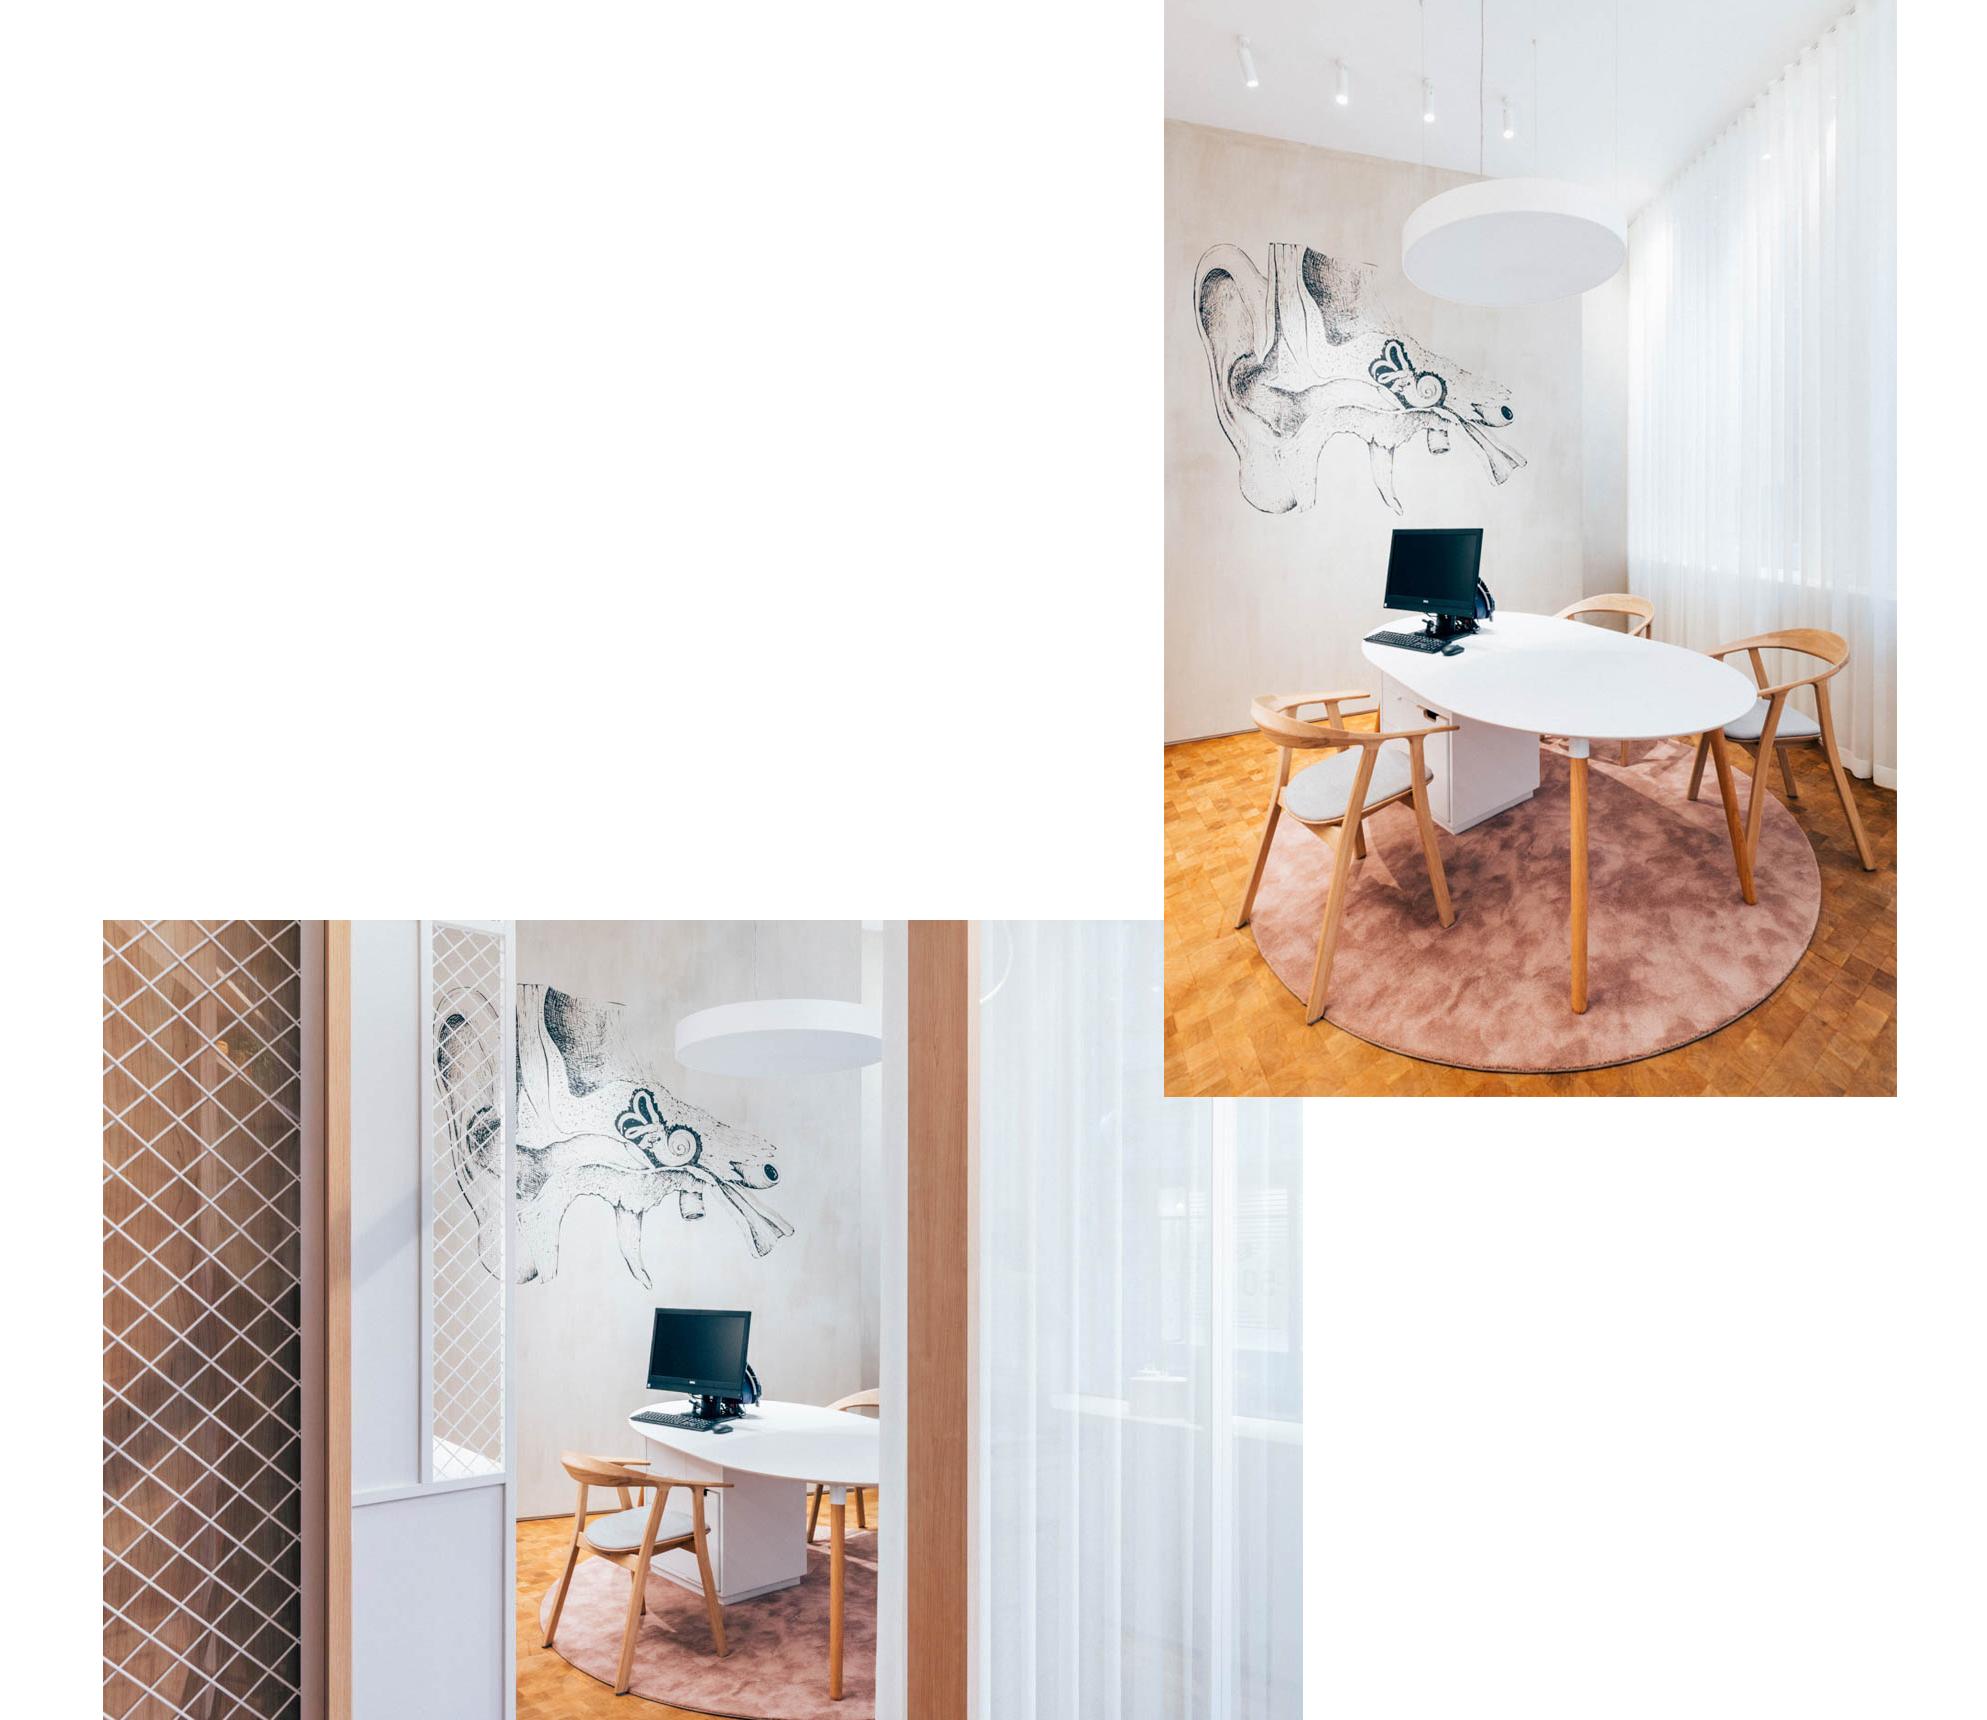 WORK_ Foon by Pinkeye Design Studio and Edith Macken